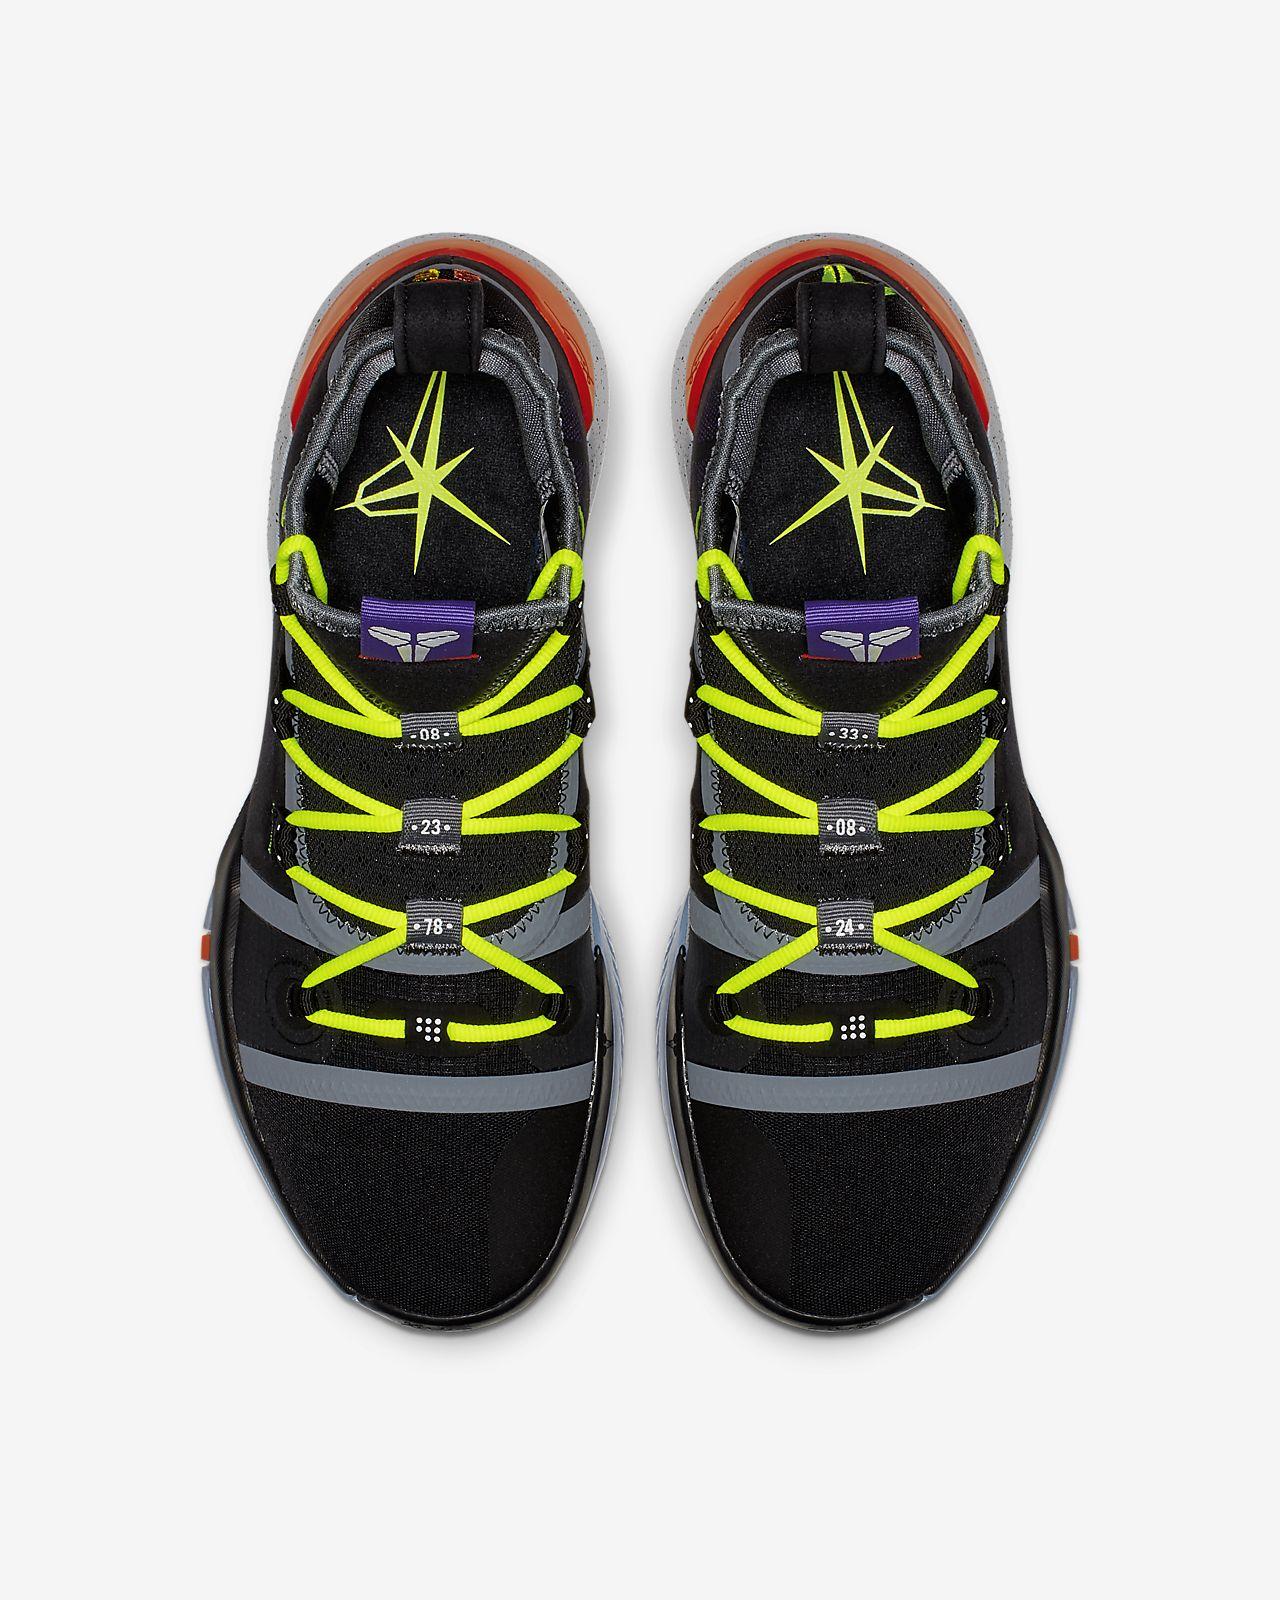 0dfa9b543a2 Low Resolution Kobe AD Basketball Shoe Kobe AD Basketball Shoe